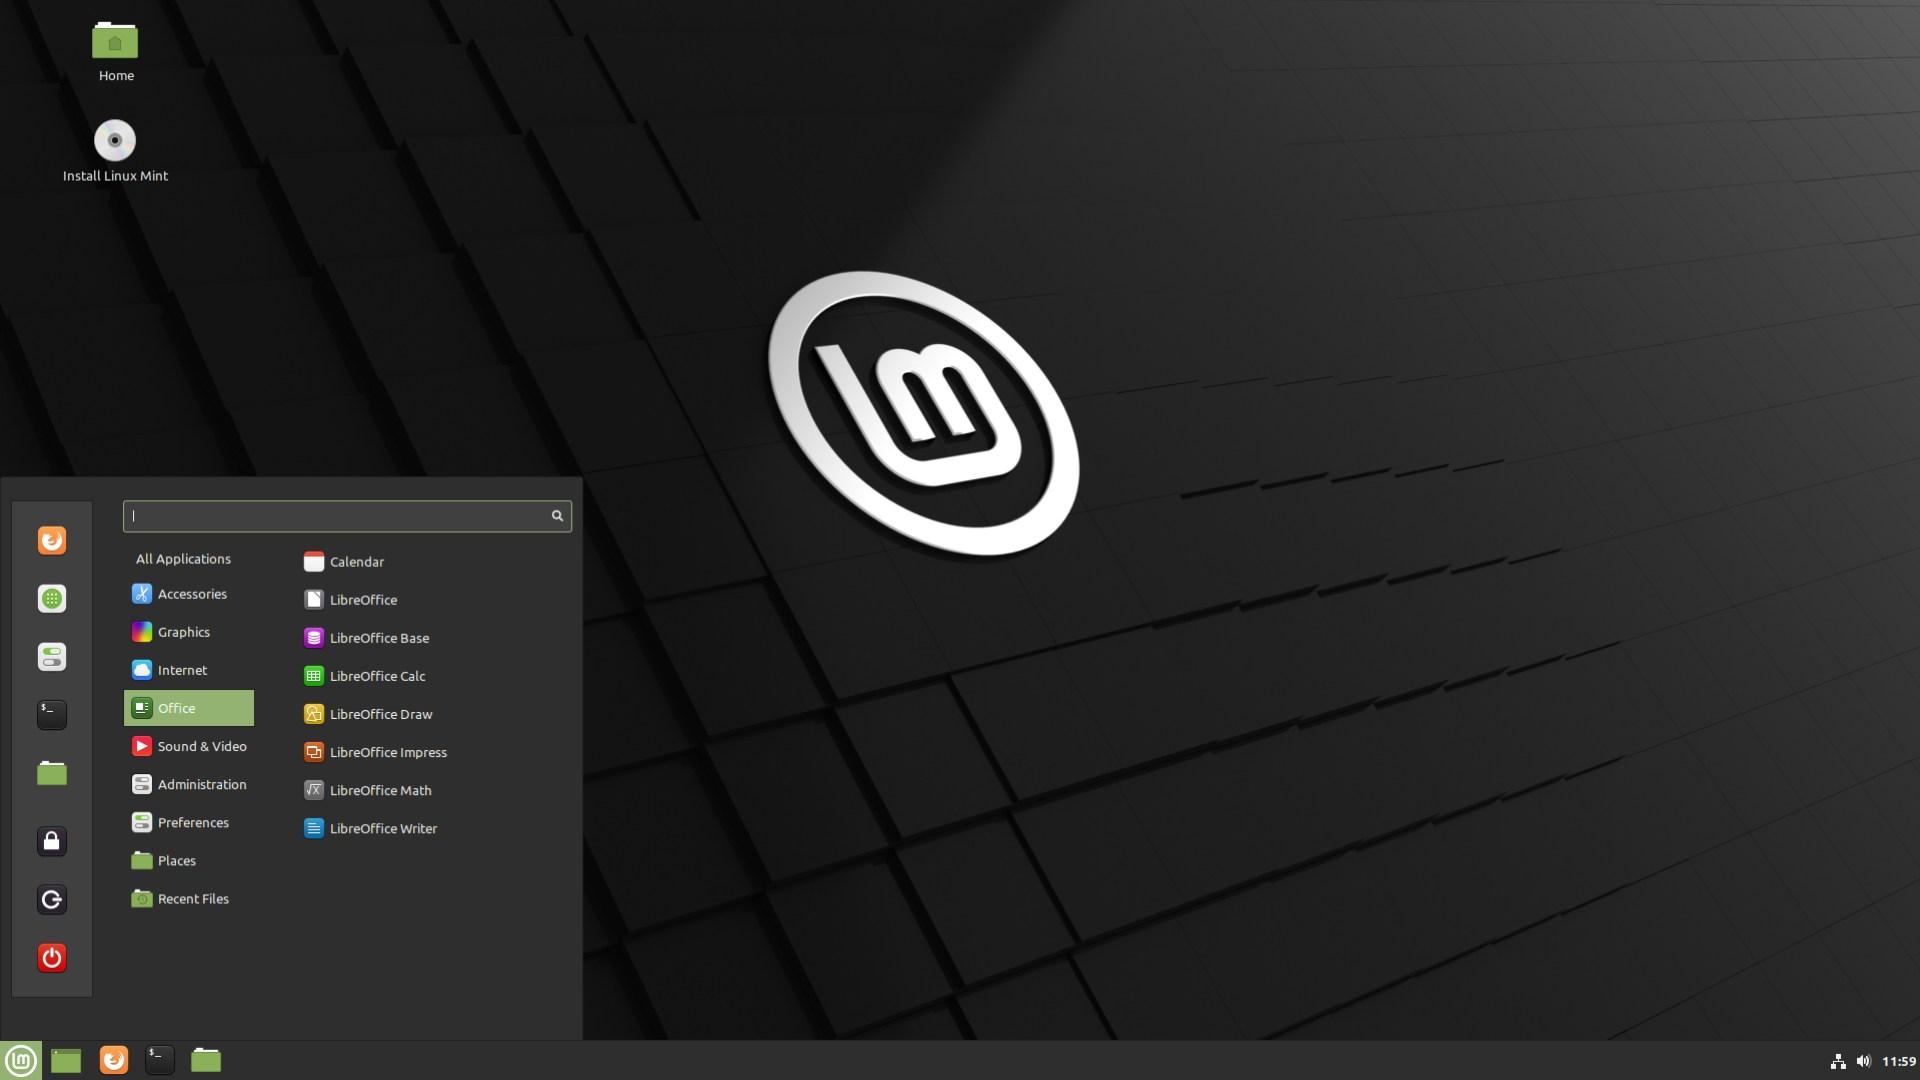 Betriebssystem, Desktop, Linux, Mint, Cinnamon, Linux Mint 20.1